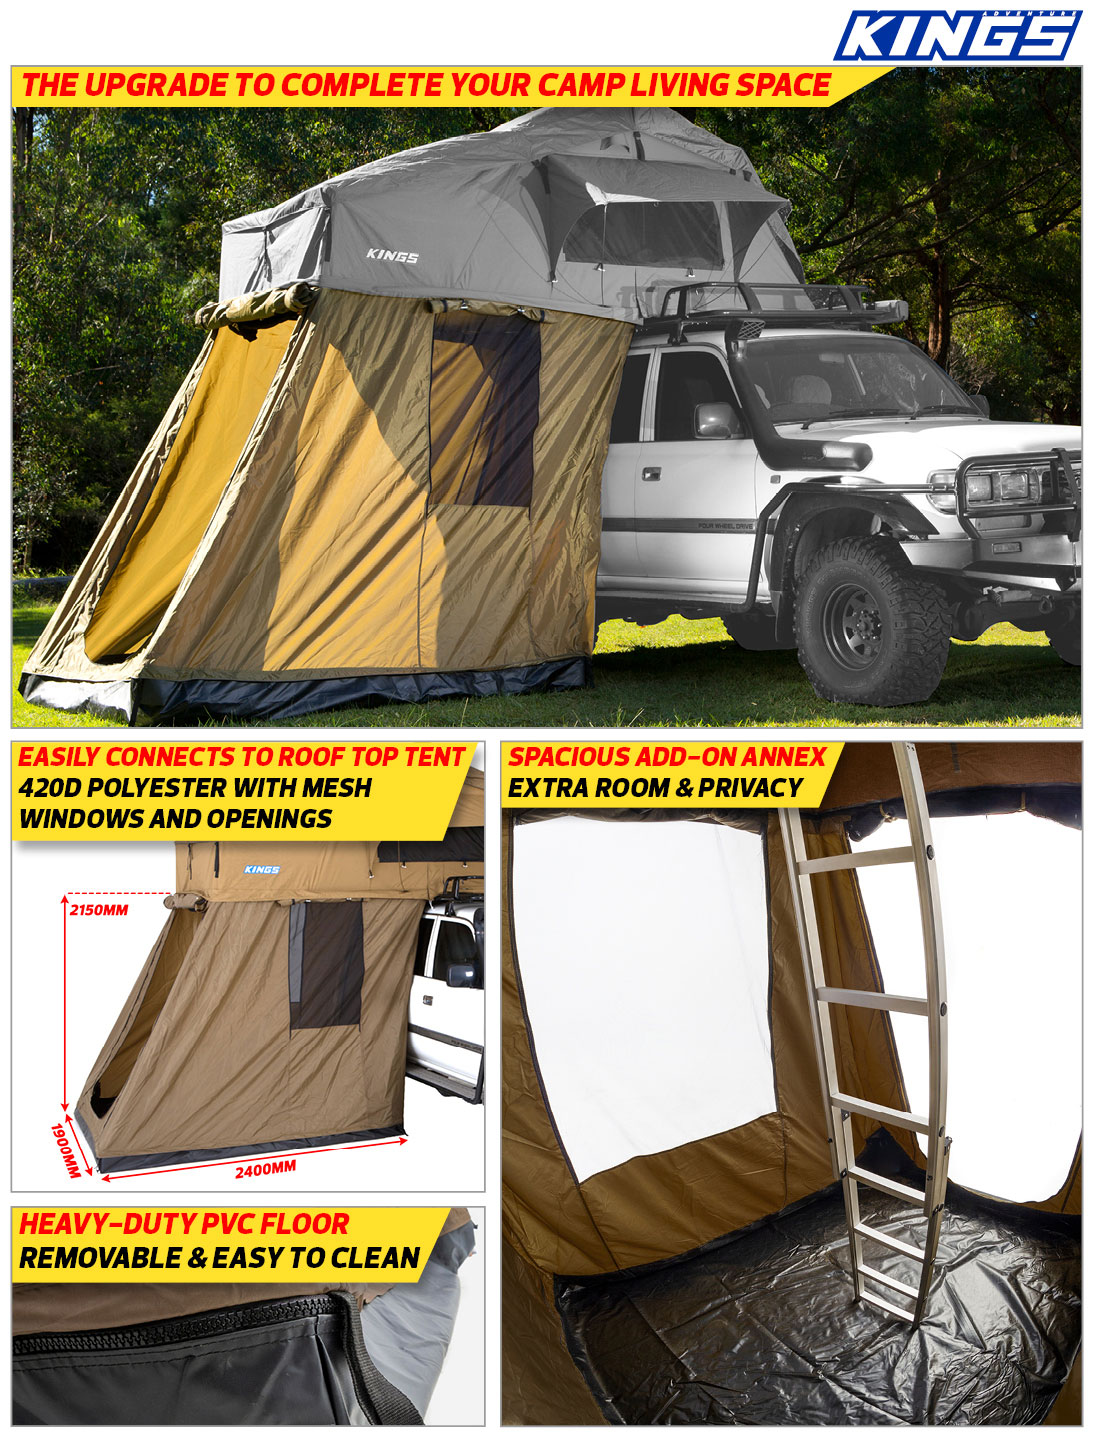 4 Man Annex For Roof Top Tent Fully Waterproof Incl Enclosed Floor Adventure Kings